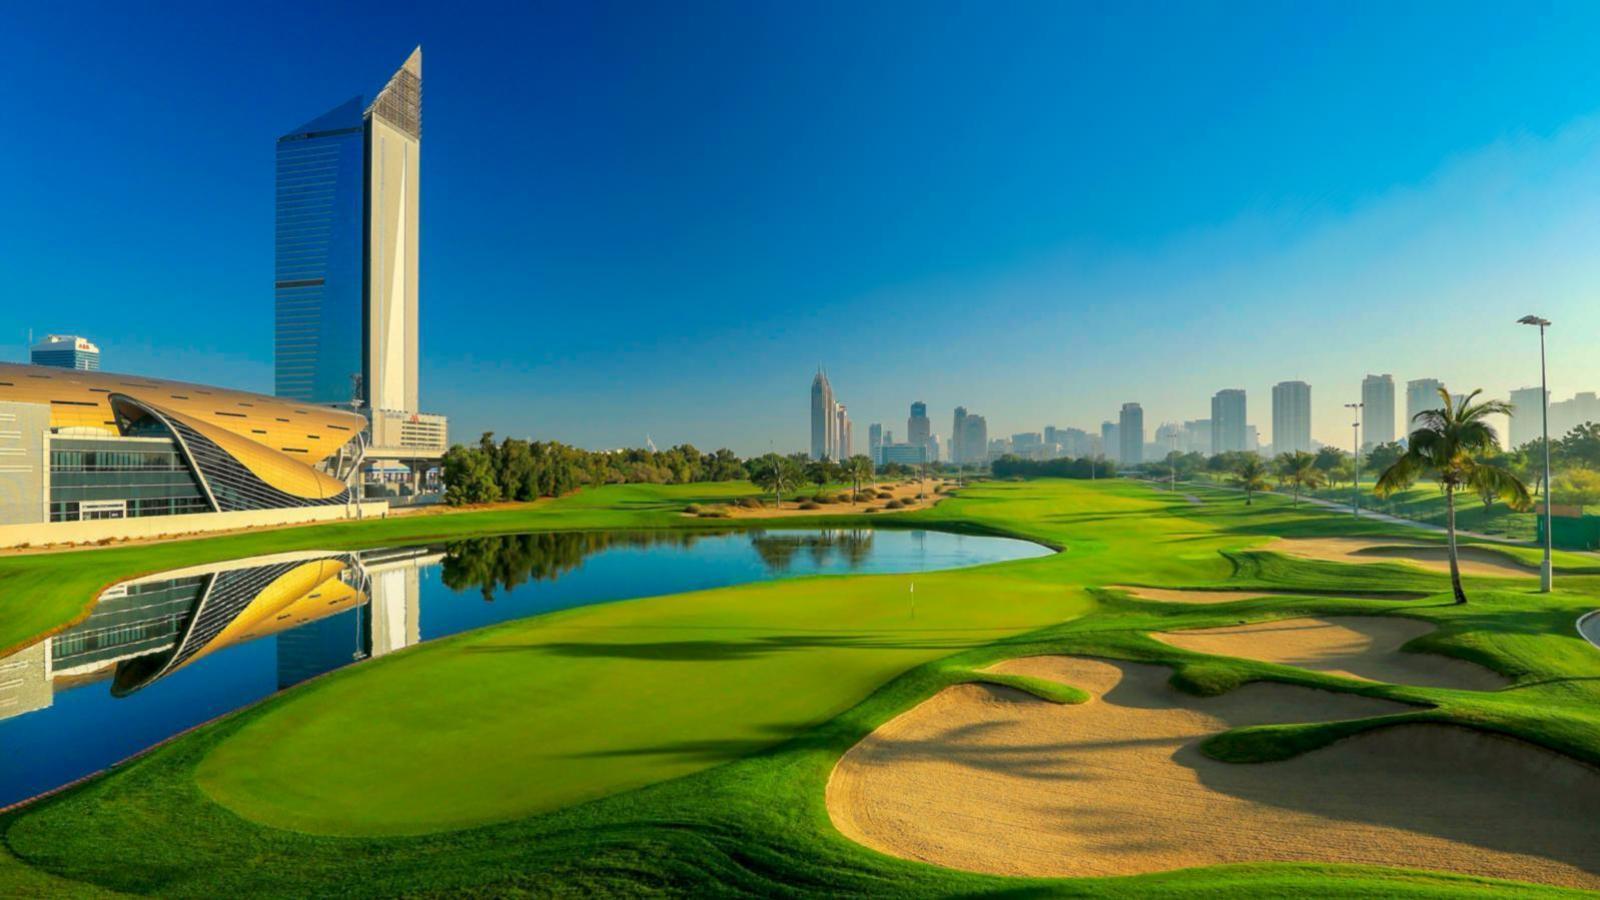 emirates-golf-club-faldo-course-10-xl